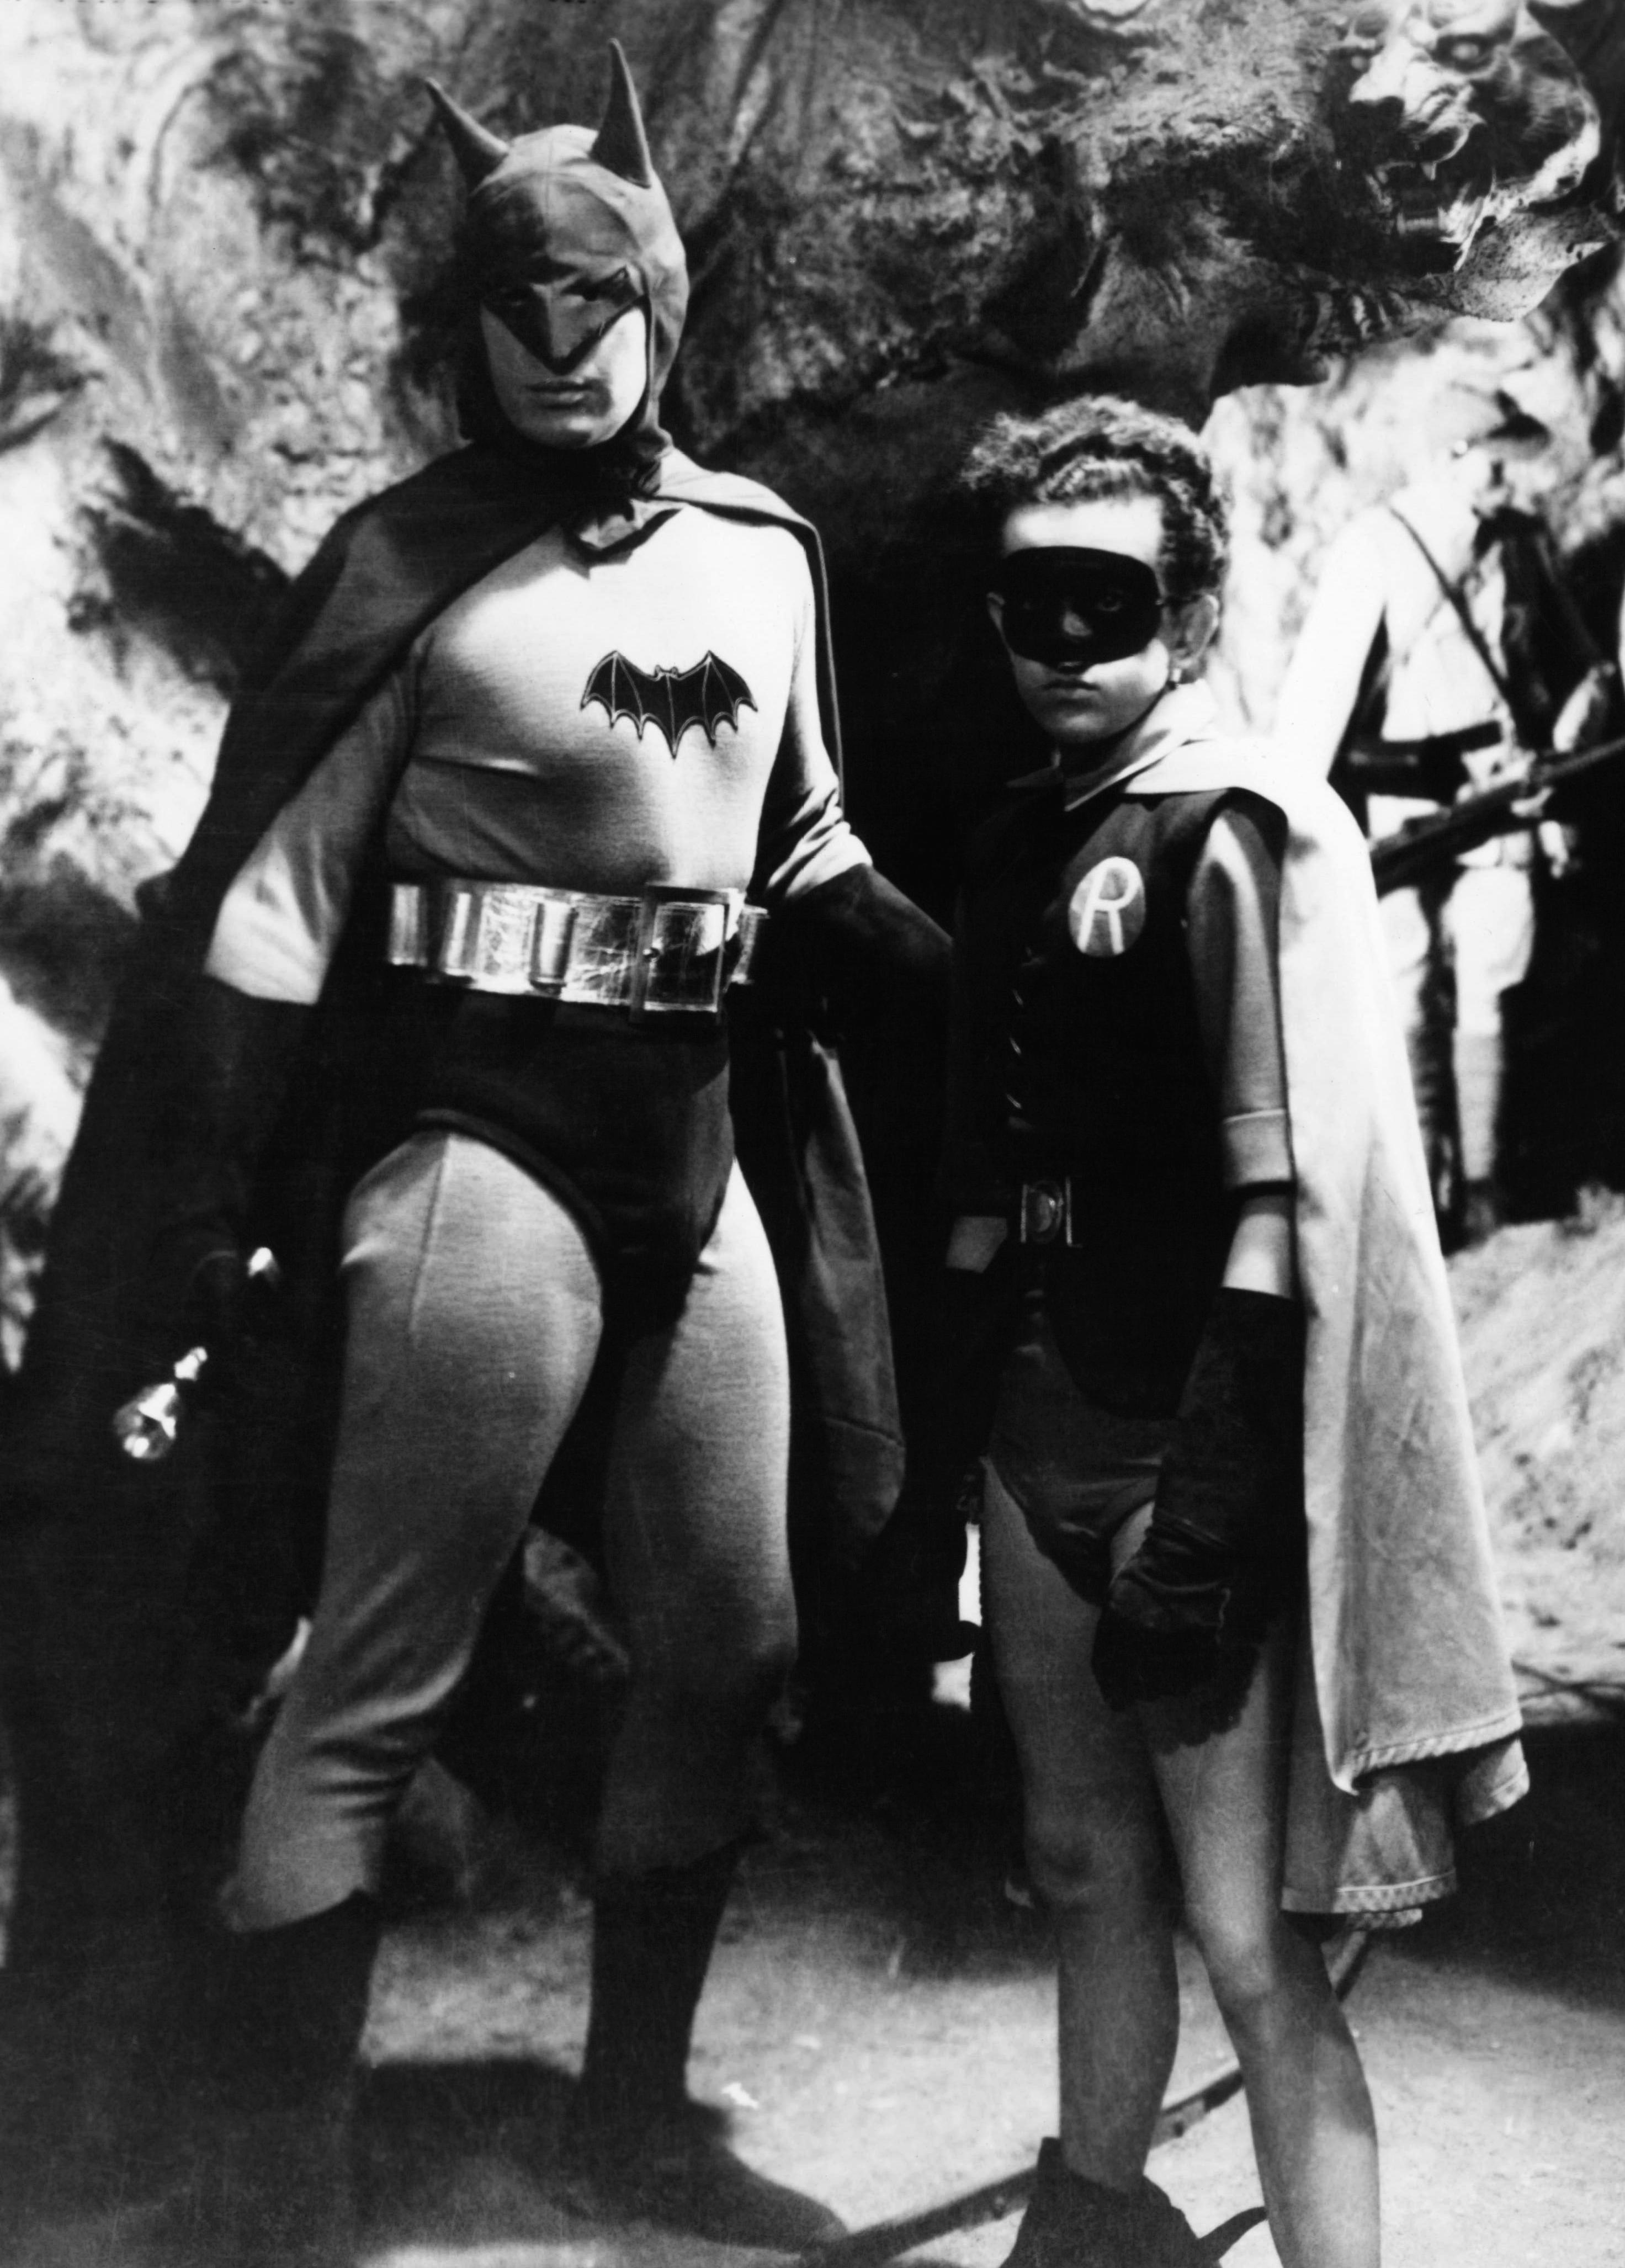 Lewis Wilson as Batman and Douglas Croft as Robin in Batman in 1943.